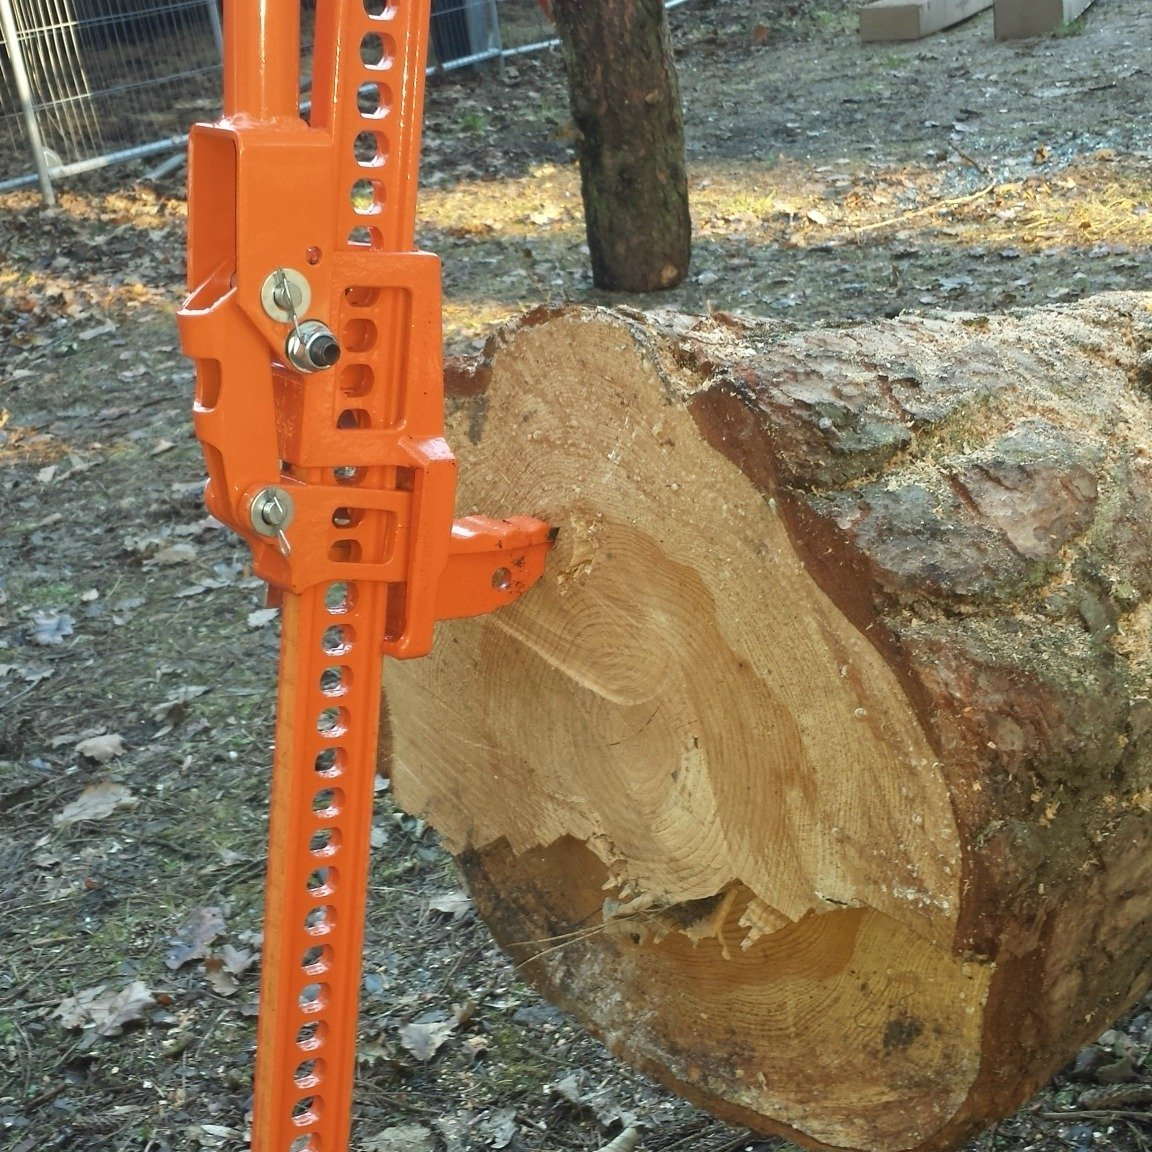 FOREST MASTER FM3-LP 3 TON LOG LIFTER TREE PUSHER STUMP REMOVER FARM JACK TREE JACK LOG MOVER